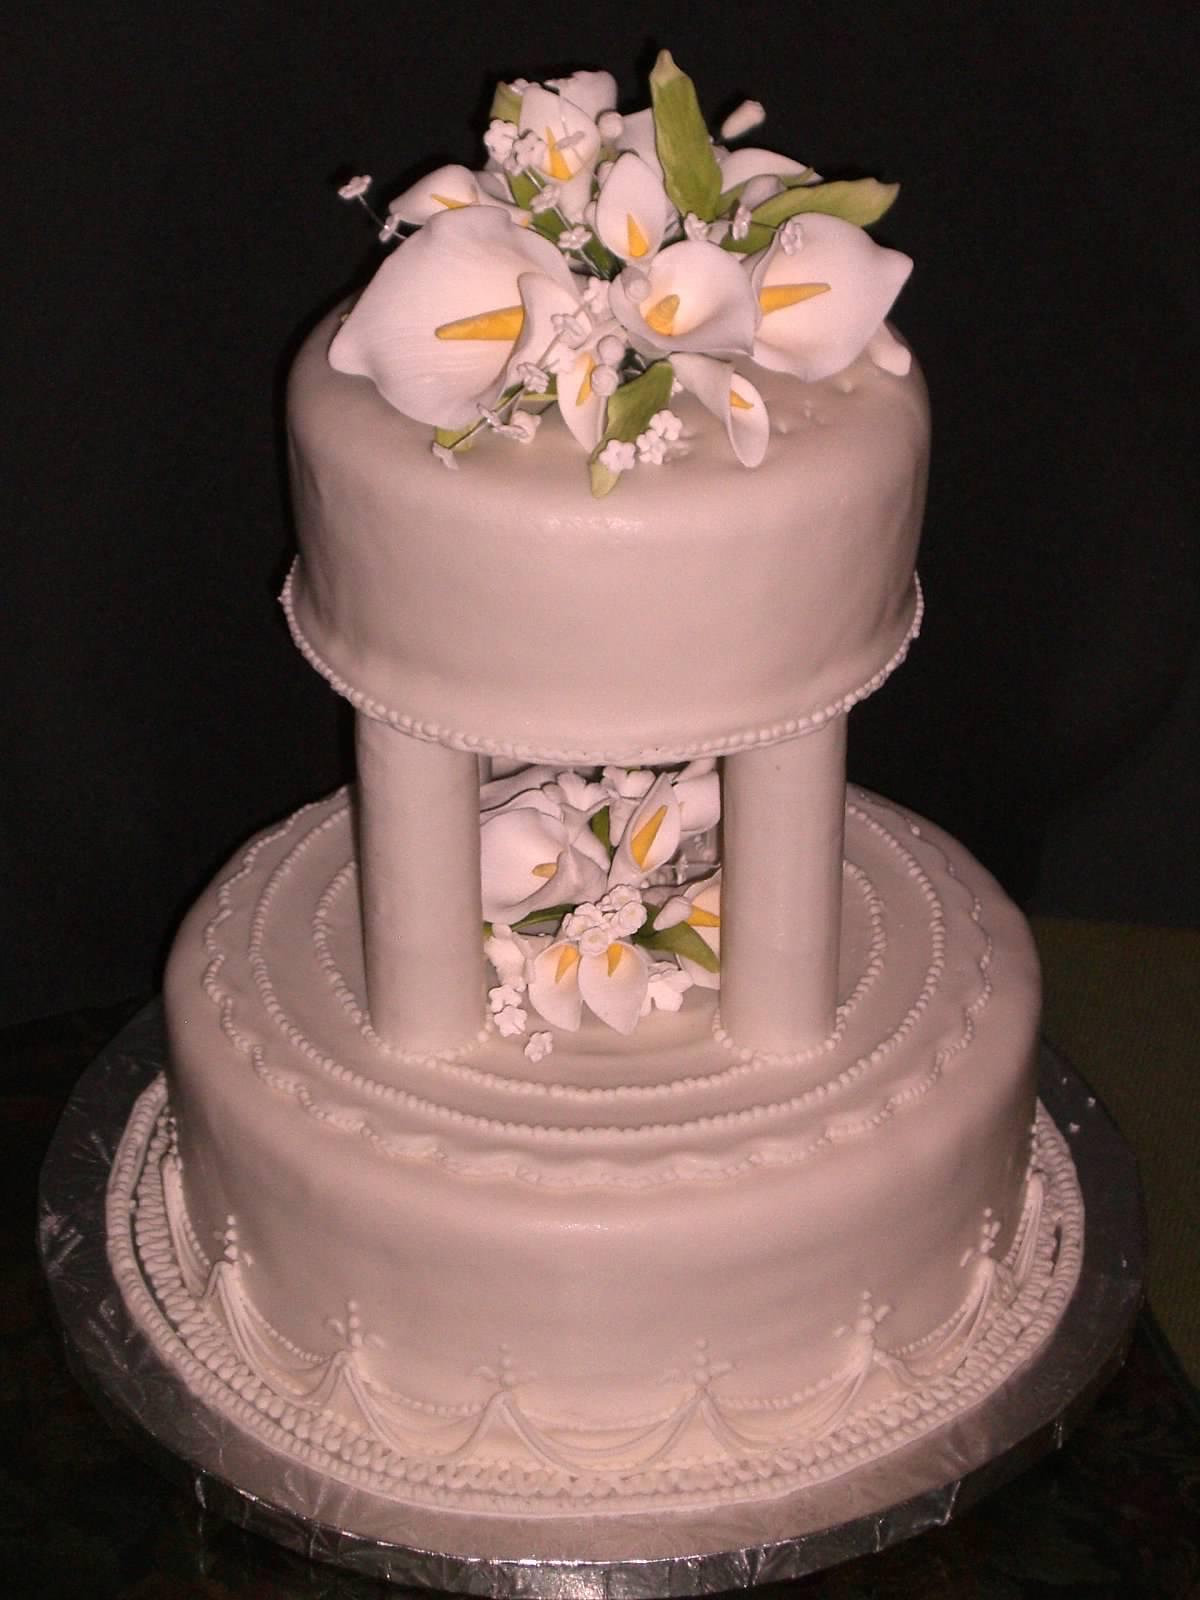 13 tier fondant cakes photo 3 tier fondant wedding cake wedding wedding cake decorating ideas junglespirit Images